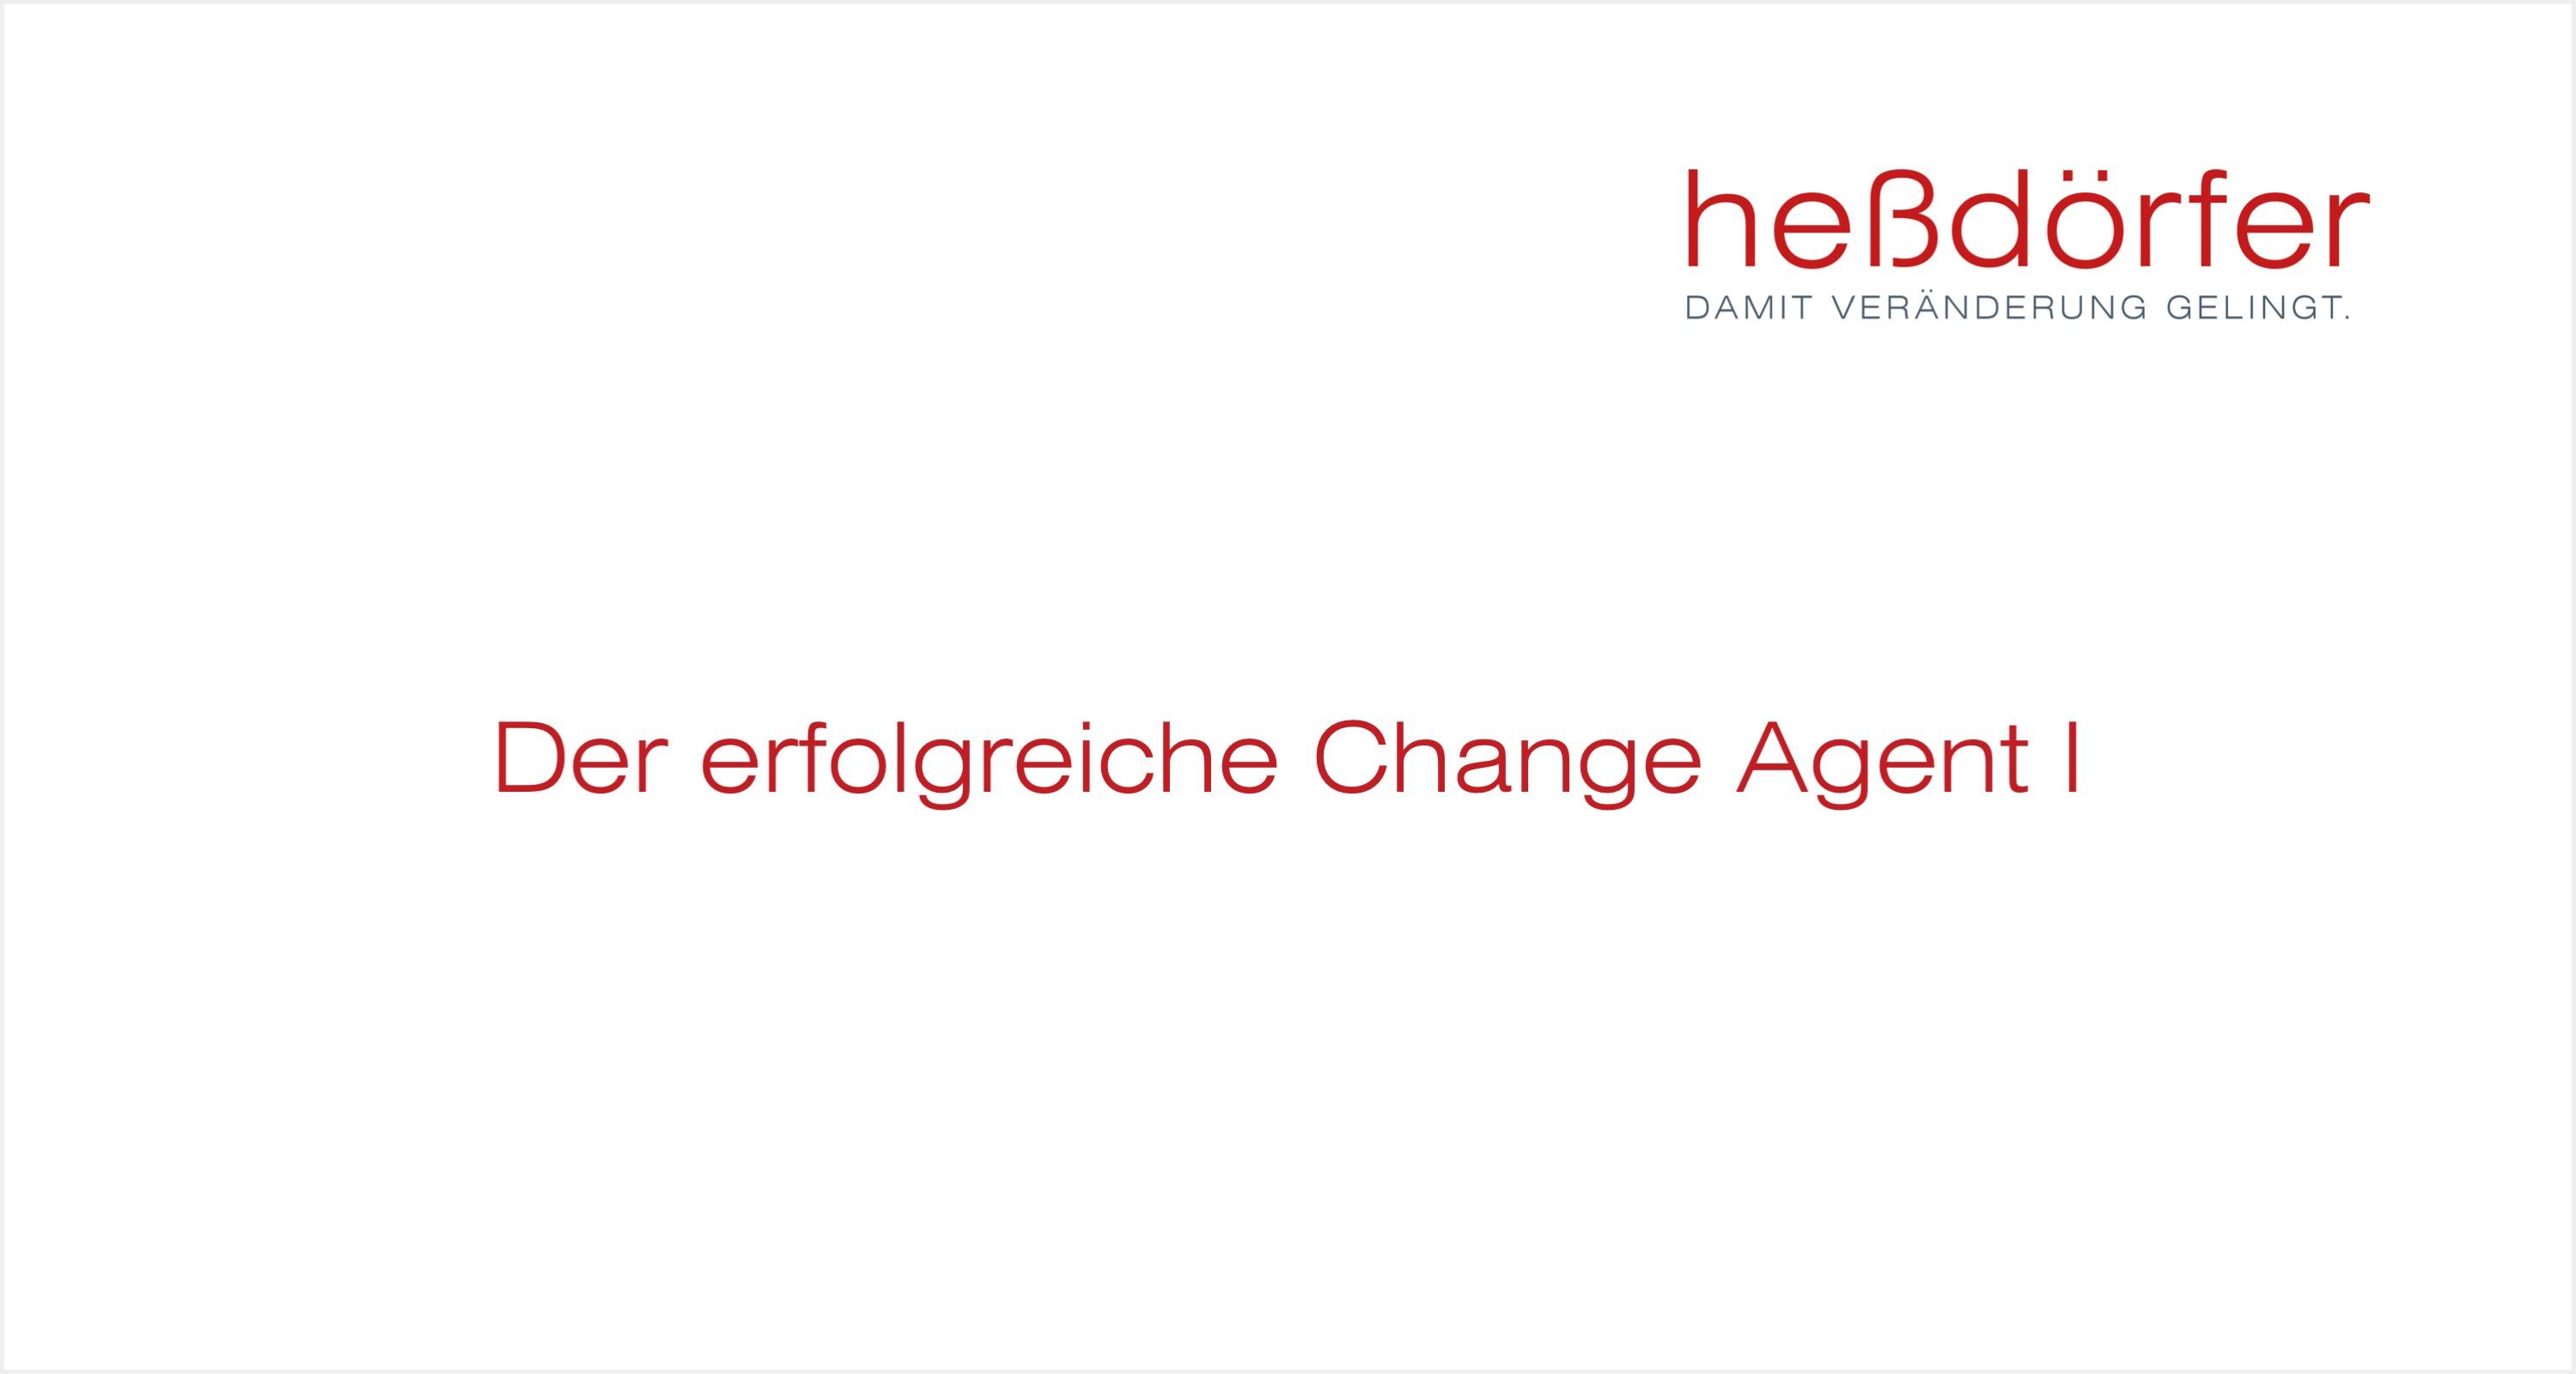 heßdörfer - Der erfolgreiche Change Agent I